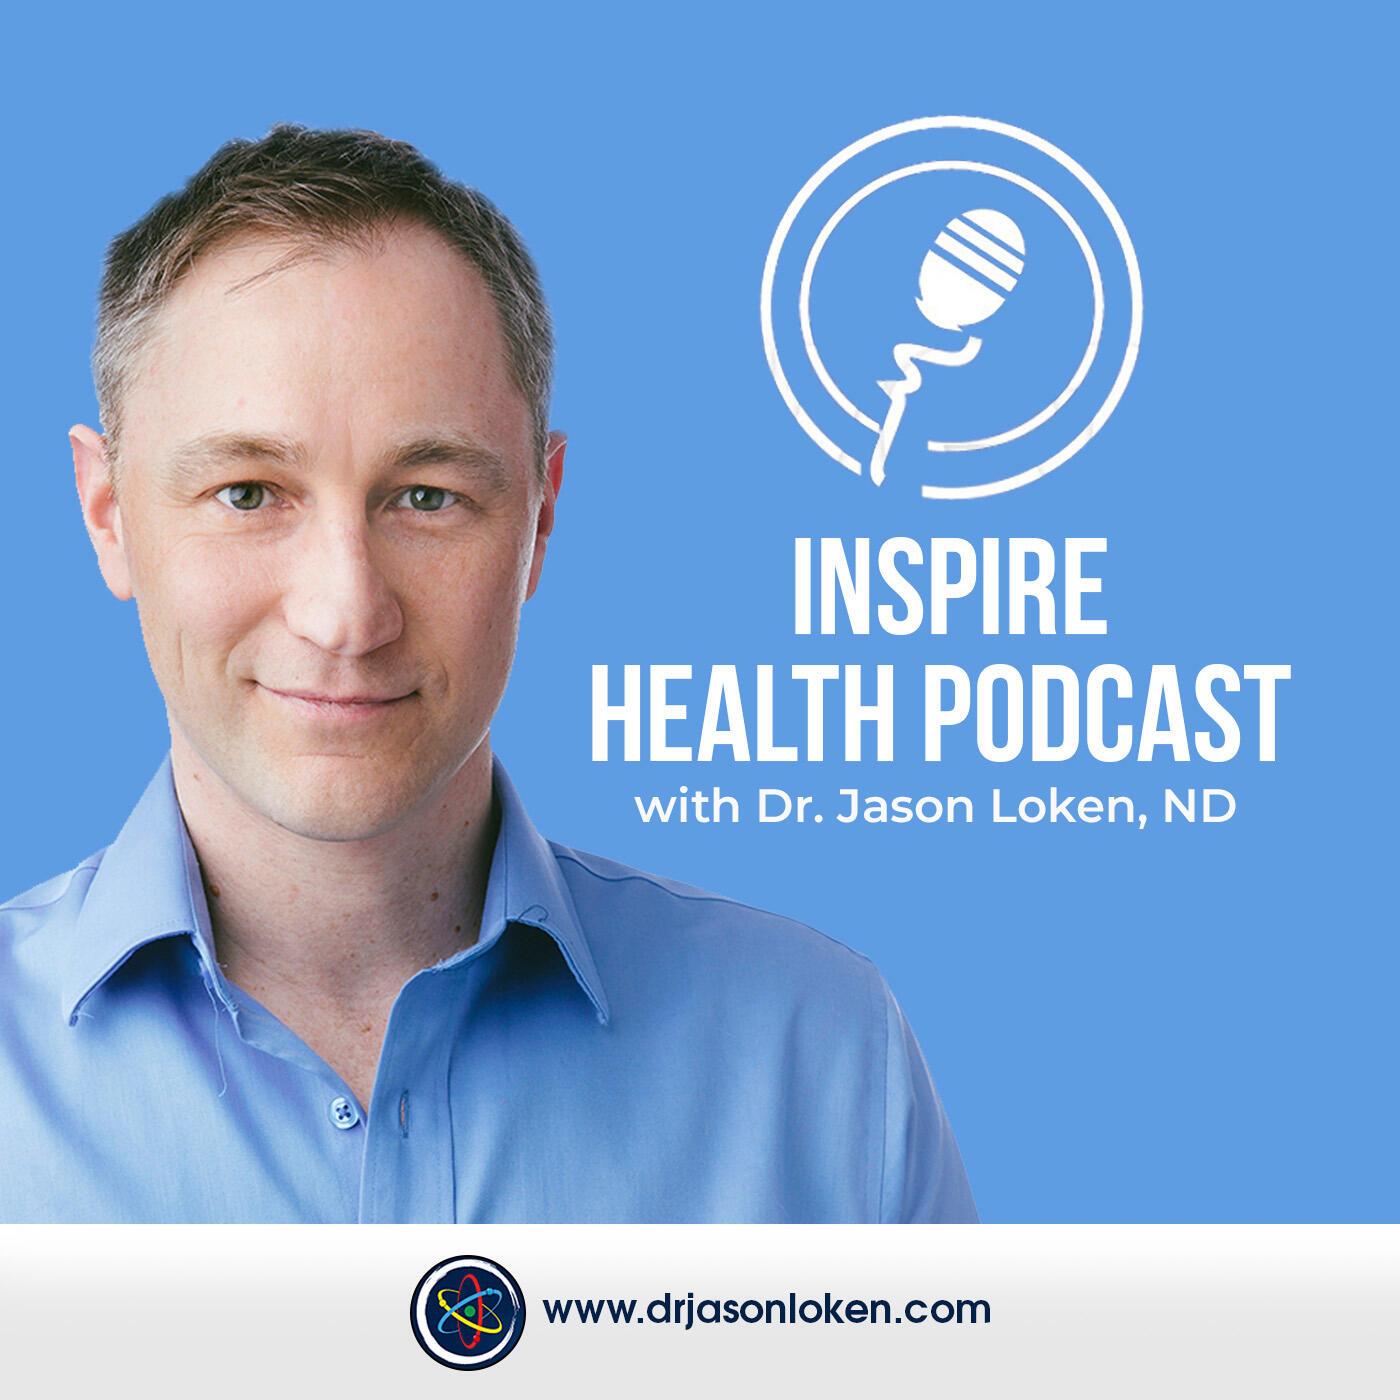 Inspire Health Podcast